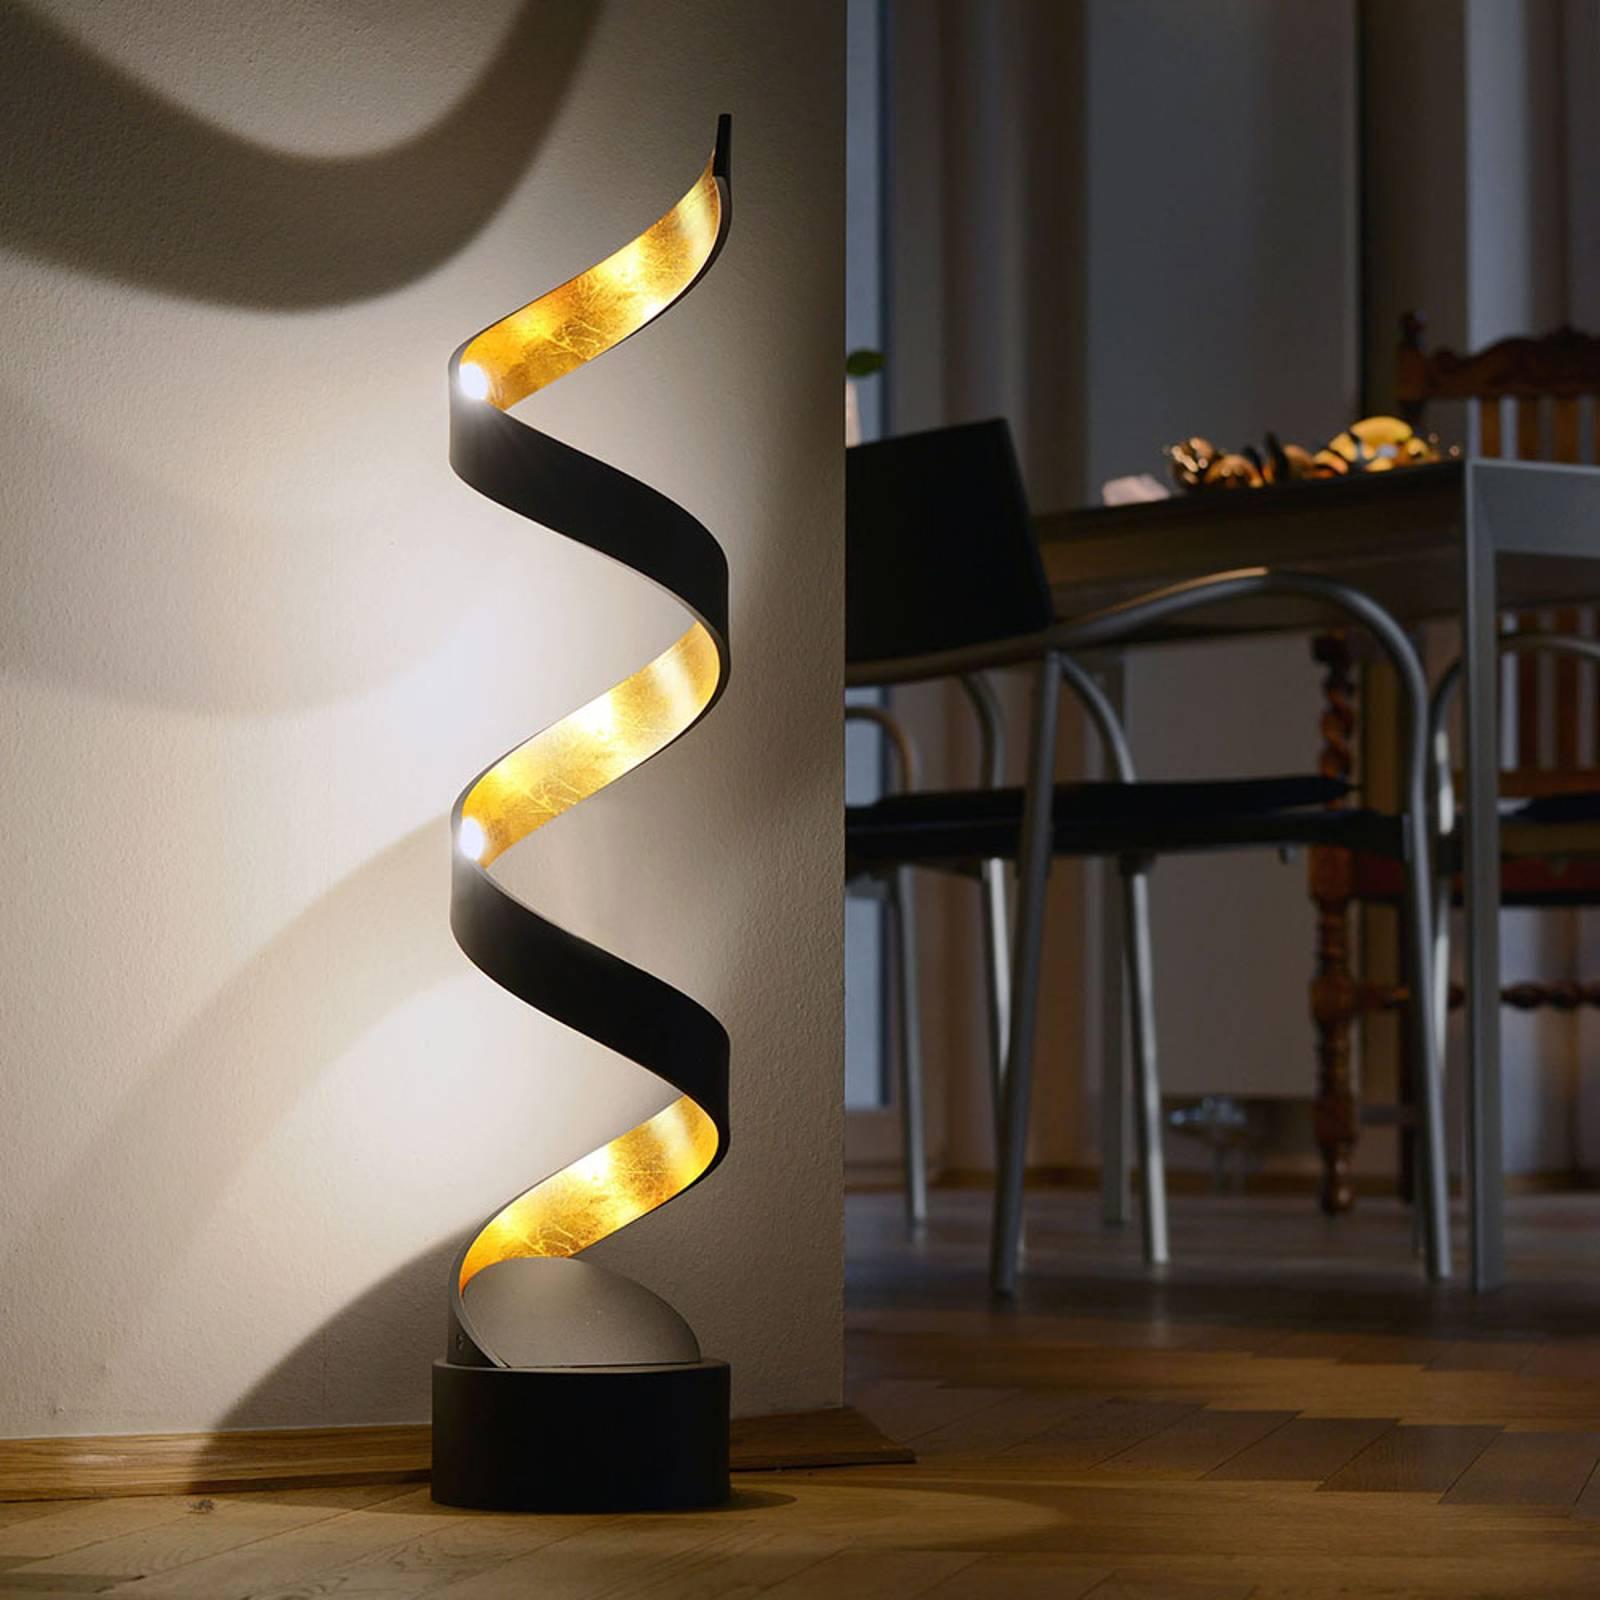 LED-pöytävalaisin Helix, 74 cm, musta-kulta